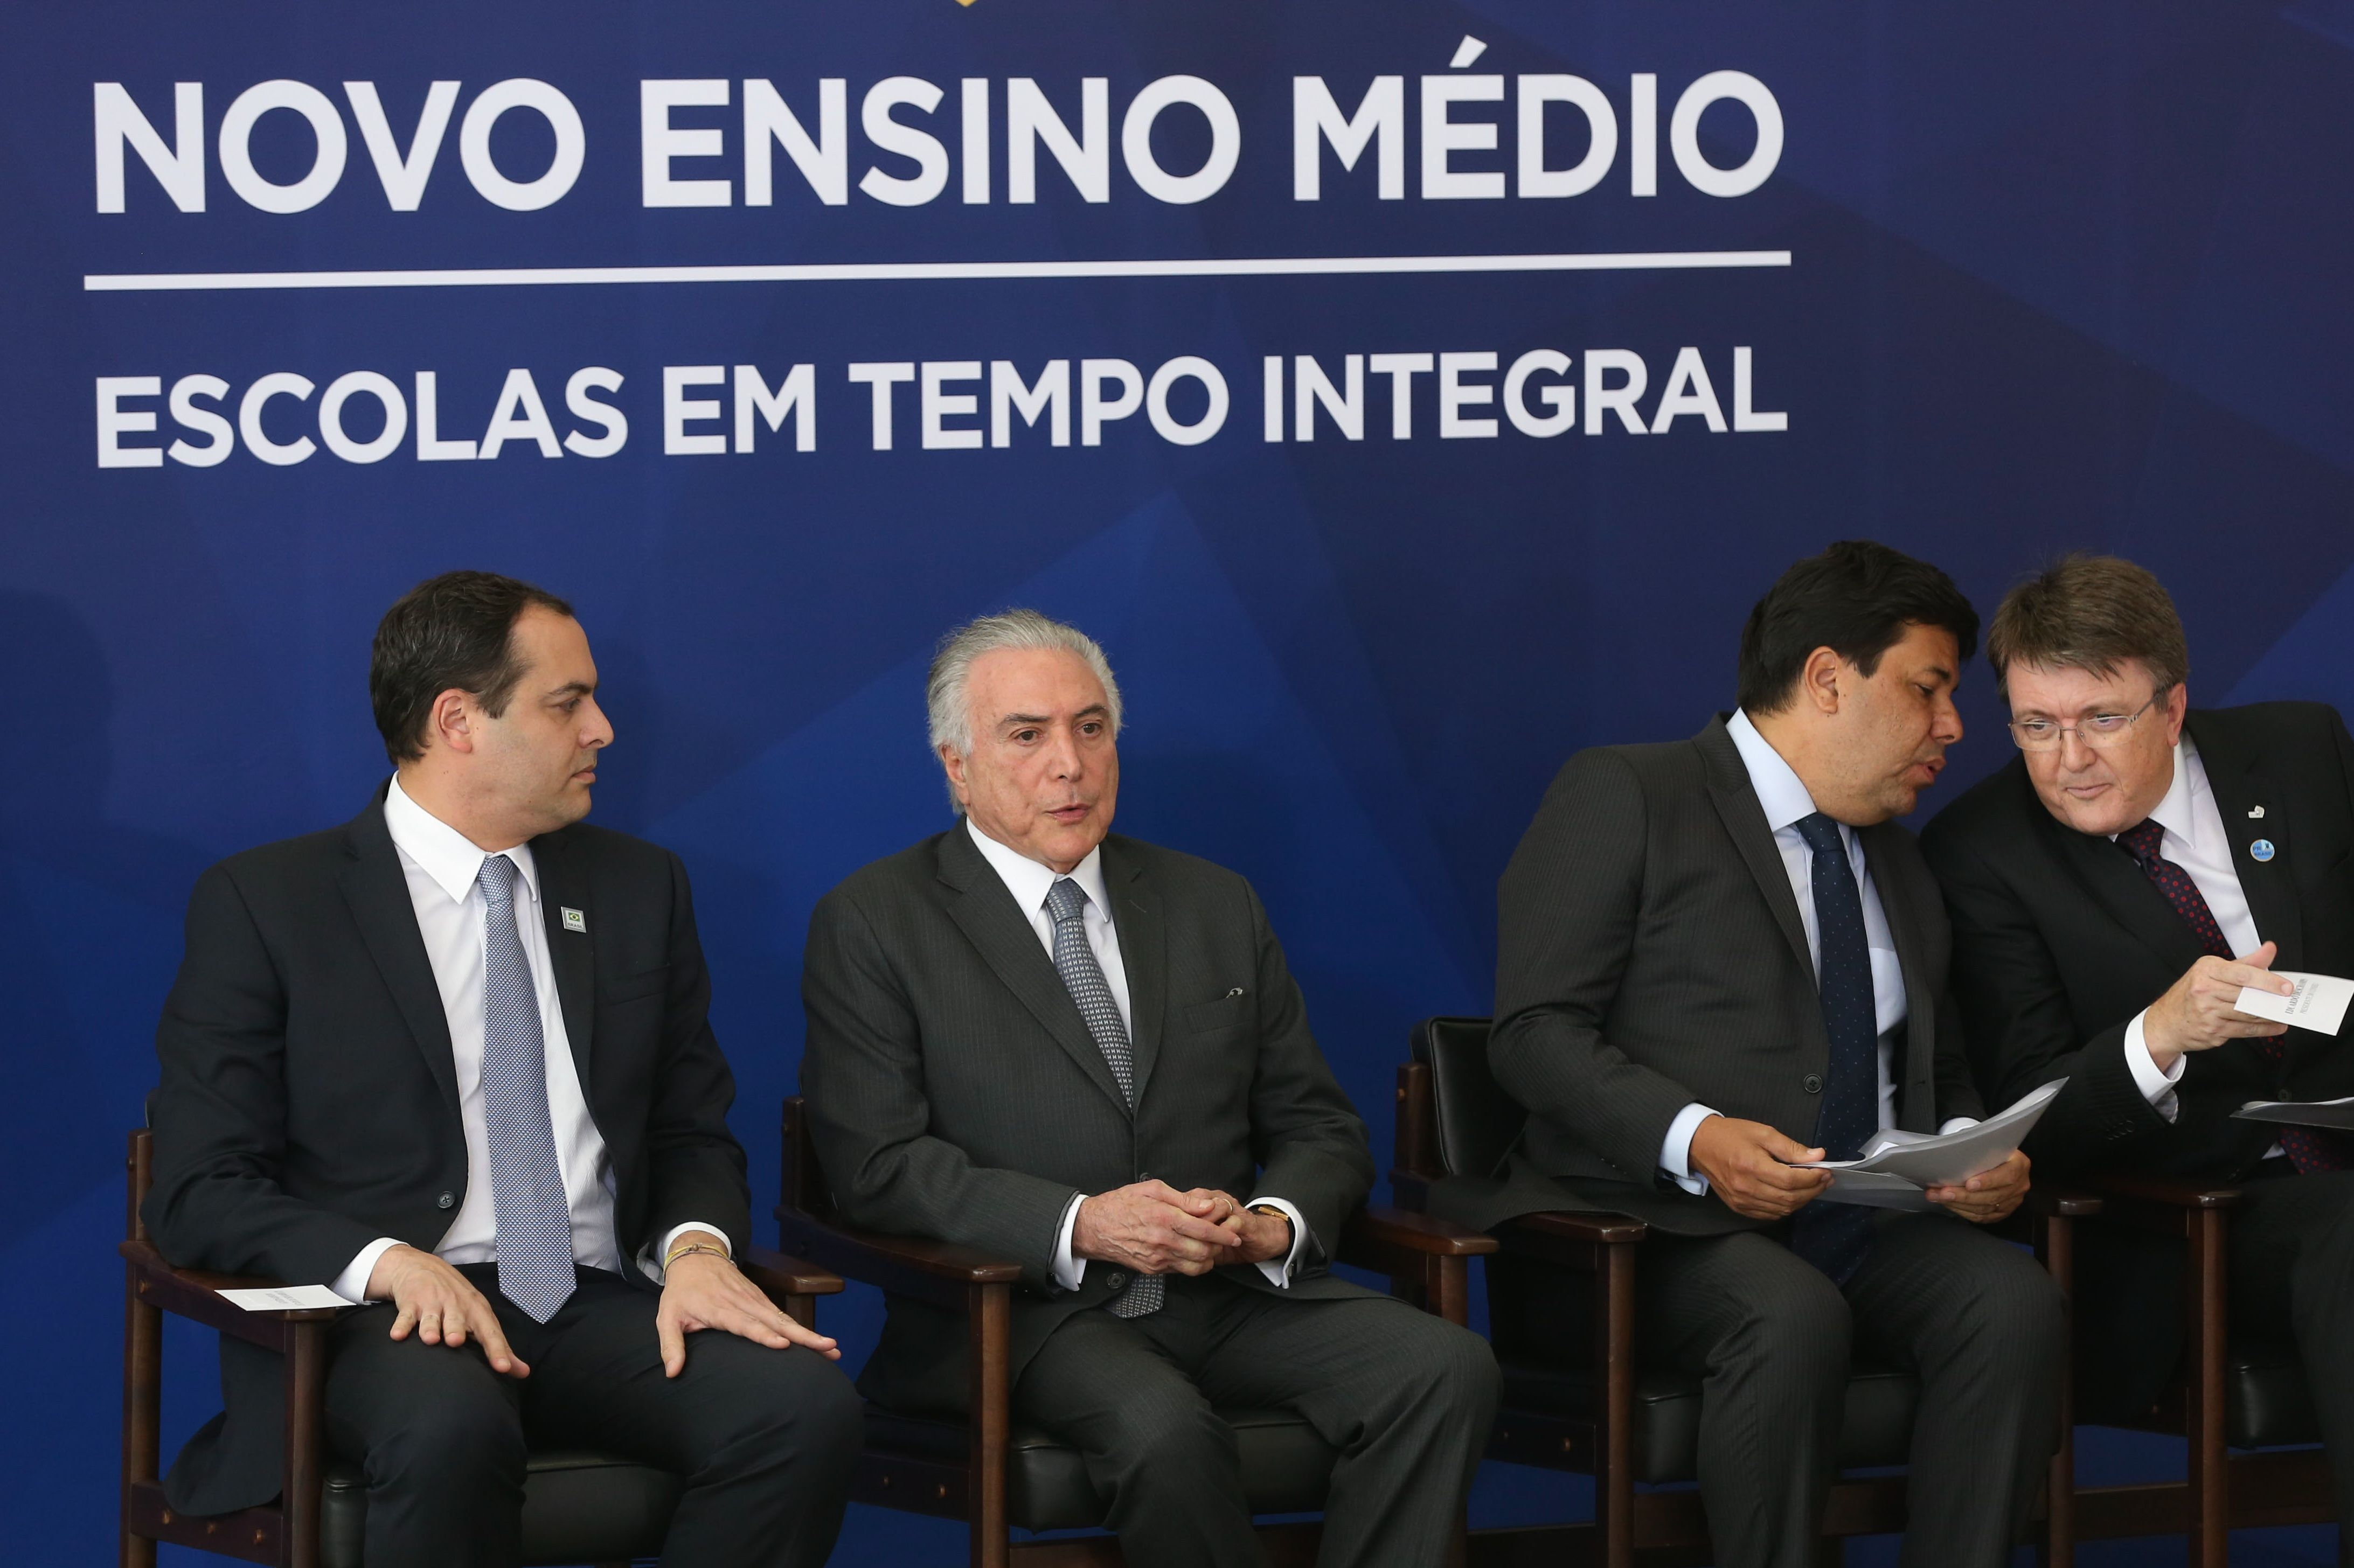 Presidente Michel Temer anunciou o novo plano nacional do Ensino Médio - Agência Brasil